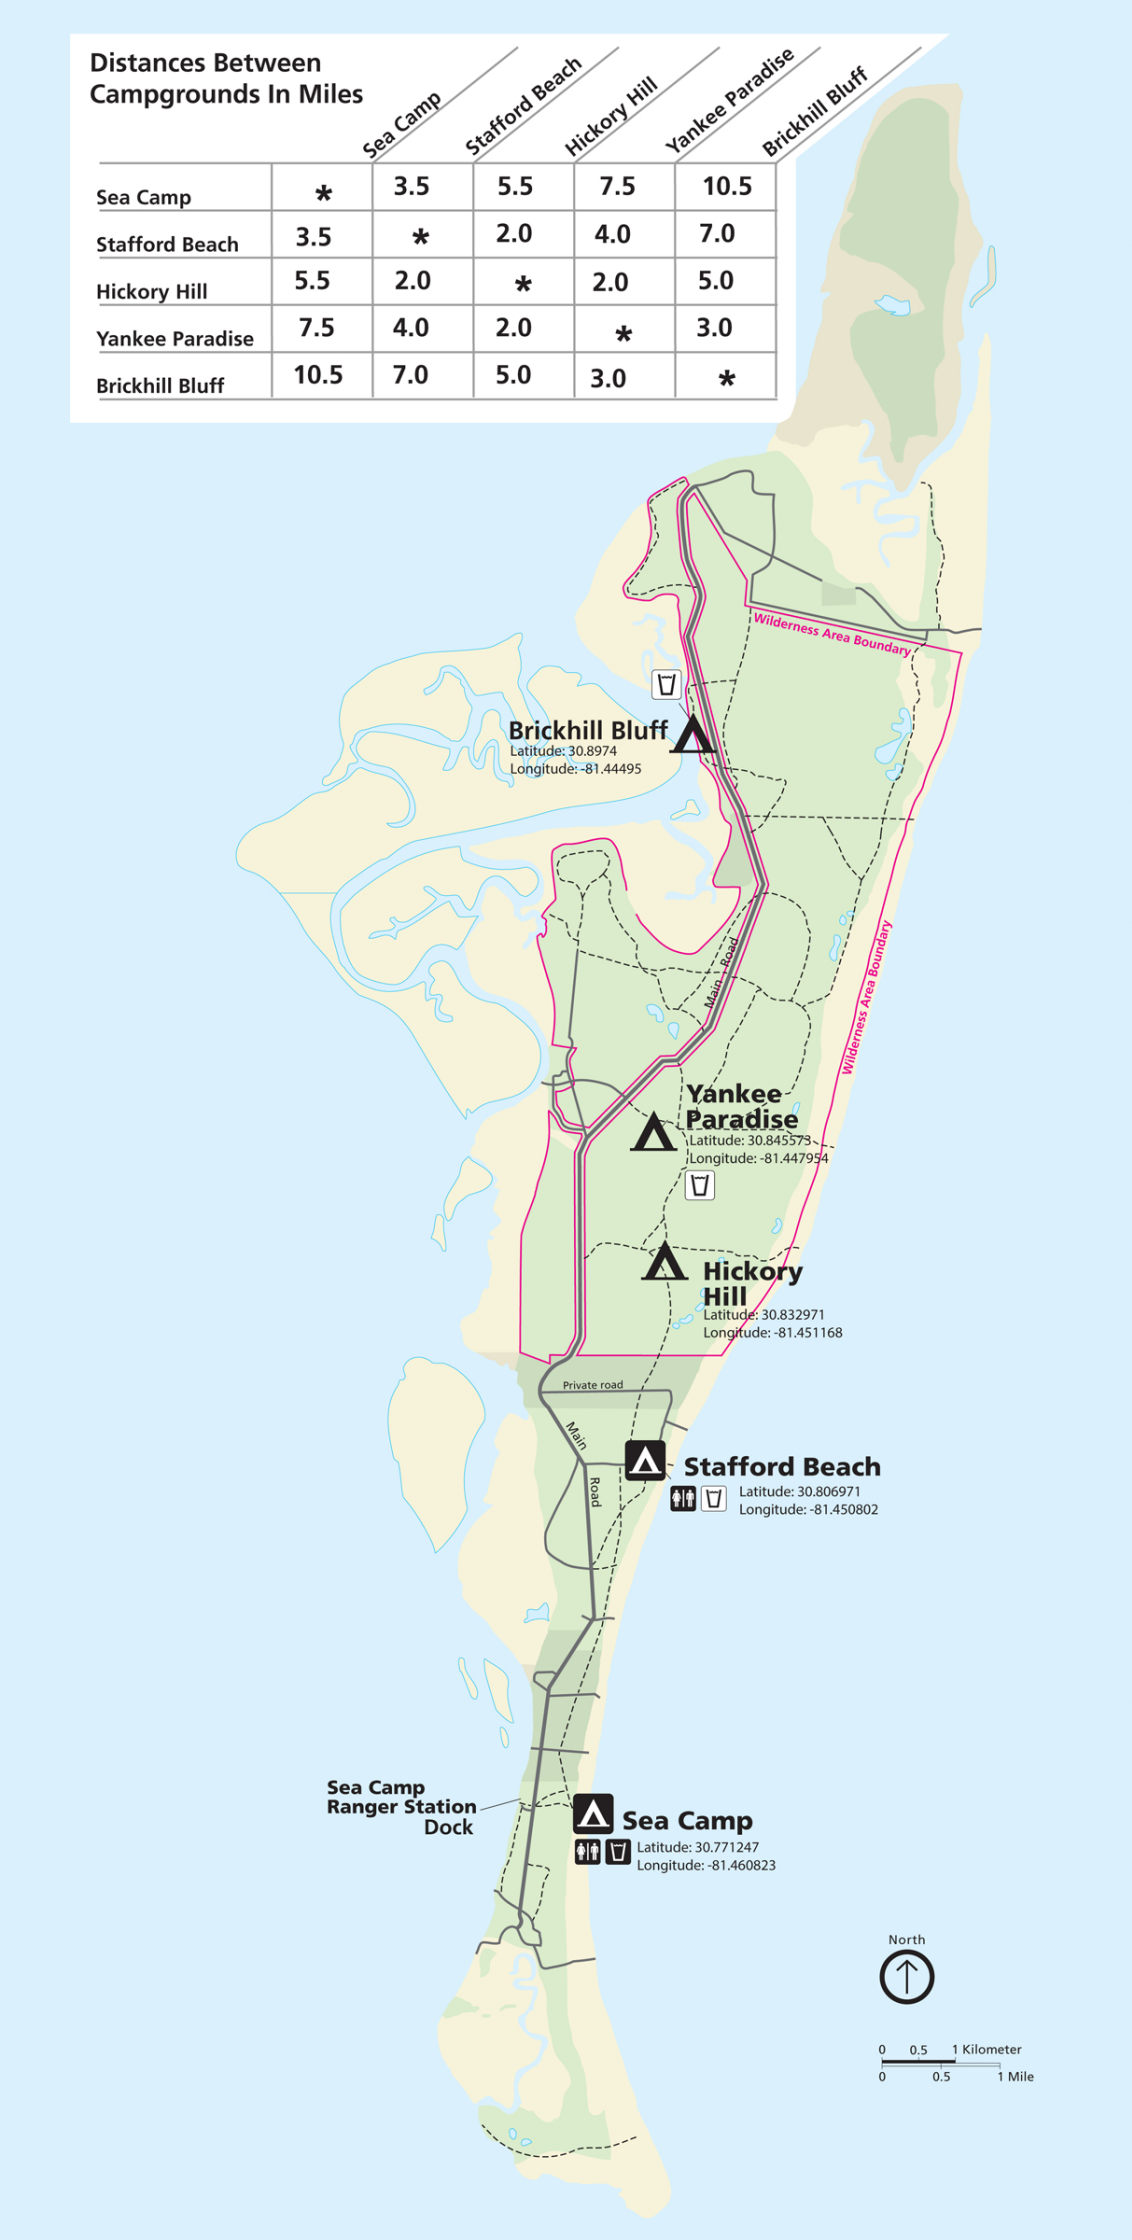 Map Cumberland Island Cumberland Island Maps | NPMaps.  just free maps, period.